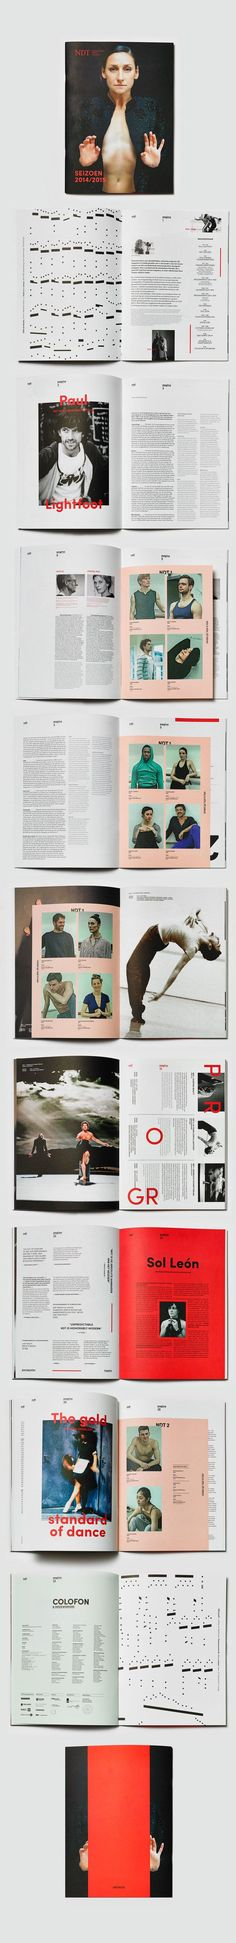 Nederlands Dans Theater by Studio Beige   Design / Layouts   Pinterest